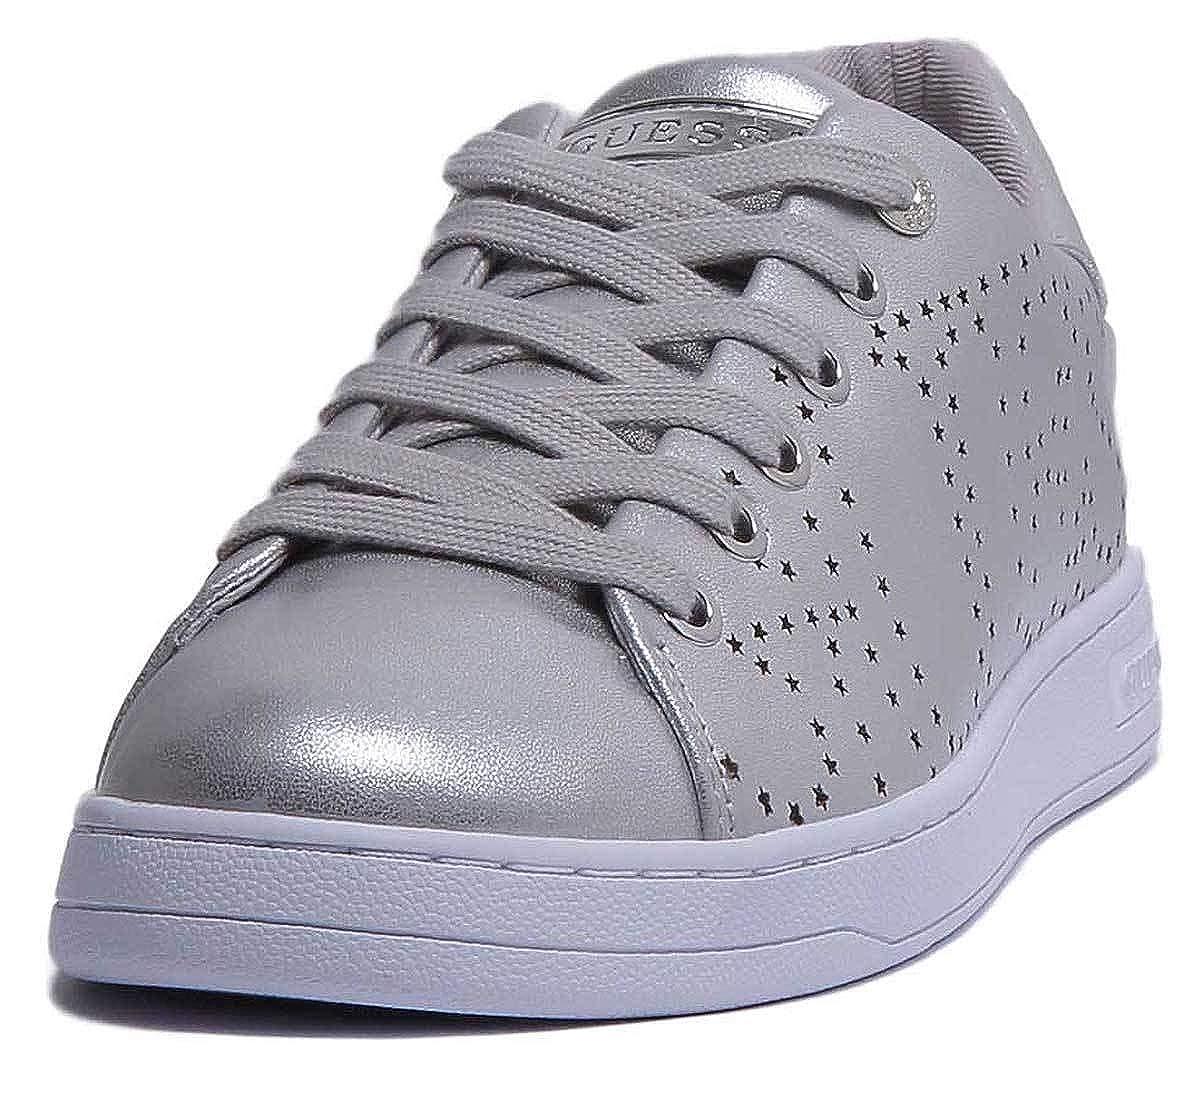 Guess Jeans FL5CARLEL12 Sportliches Schuhwerk Damen